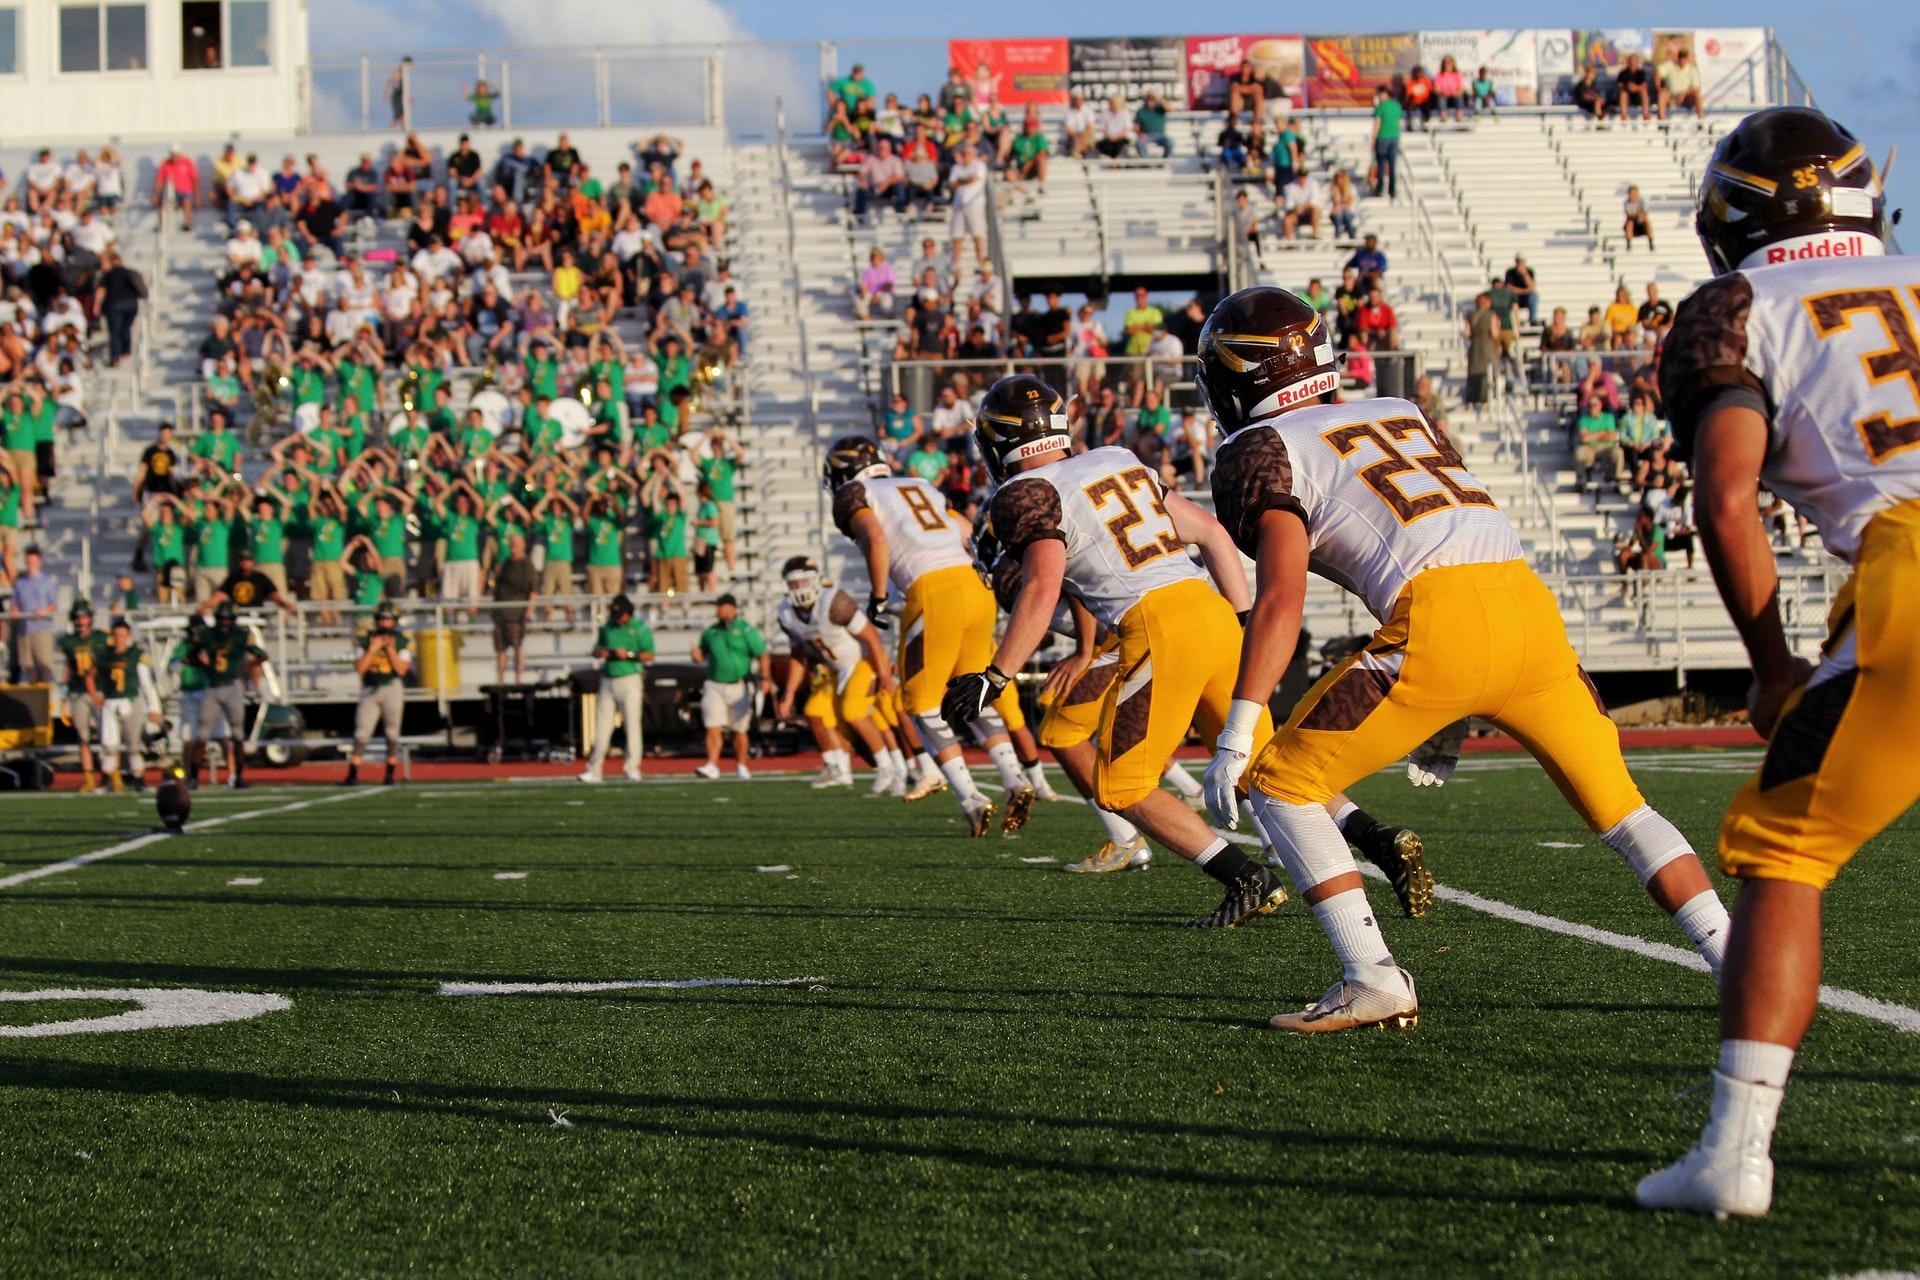 Photo of college football game at JFK Stadium, Springfield, United States